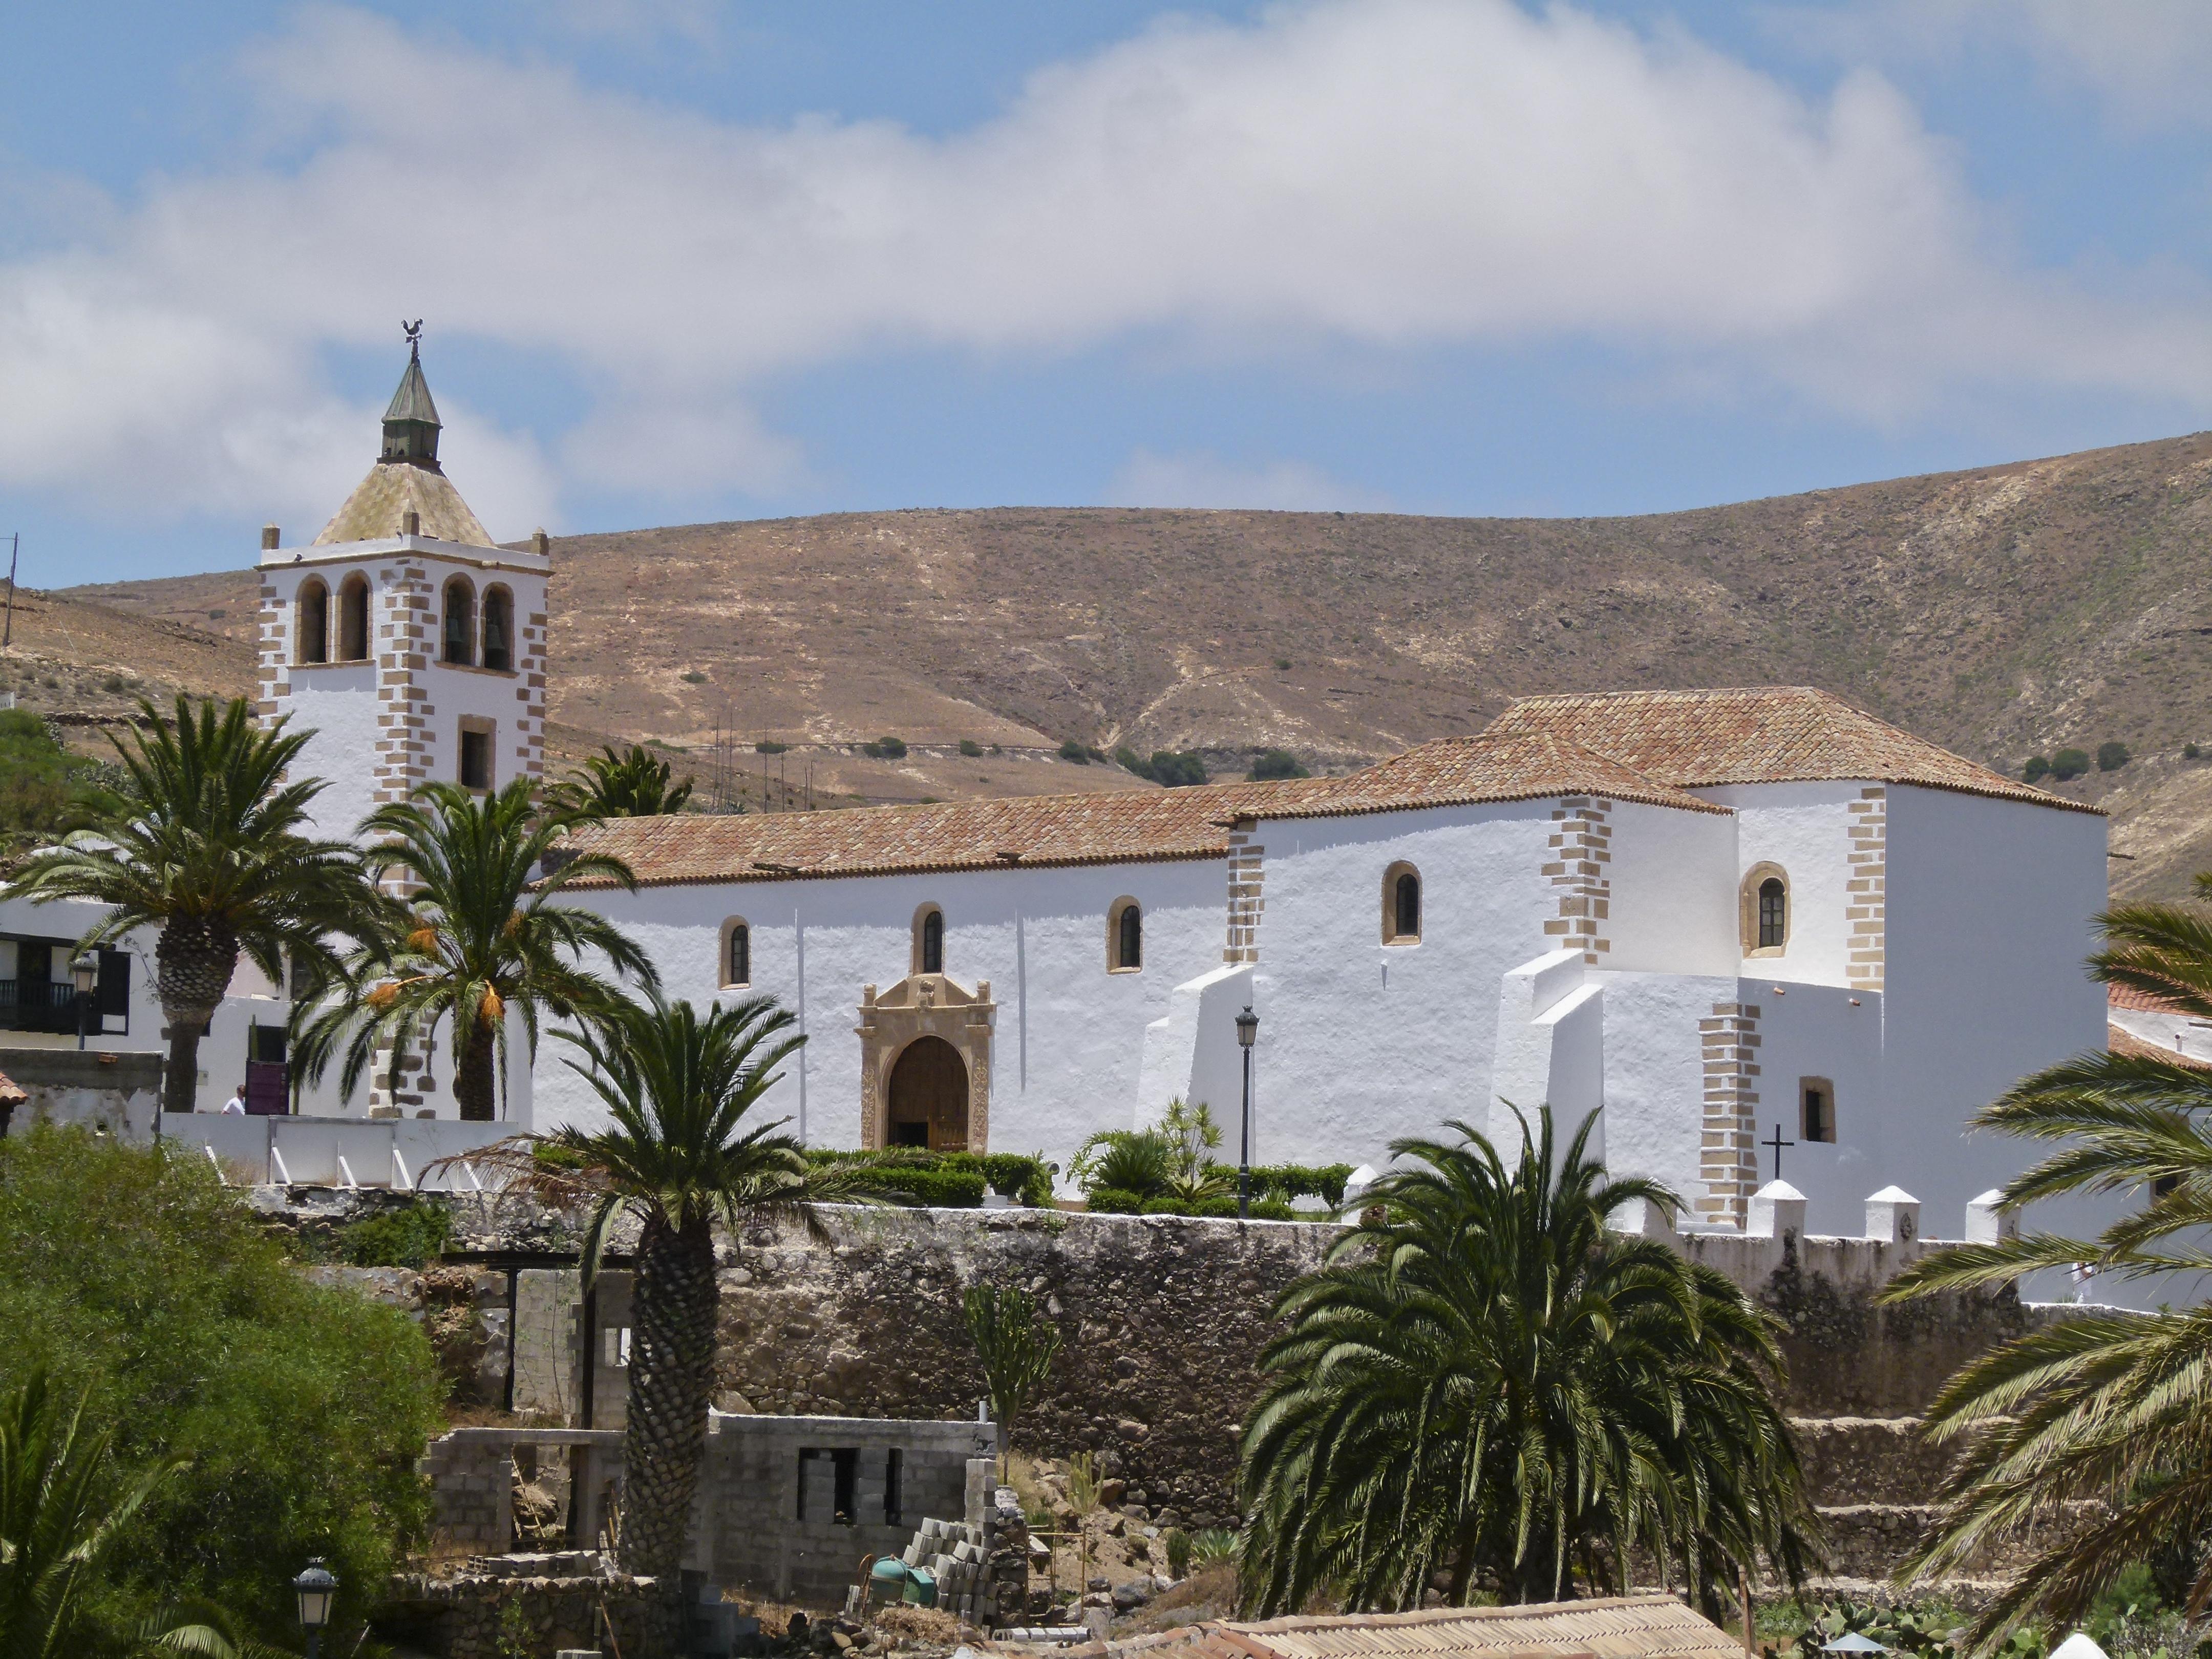 Canary Islands Fuerteventura Beaches